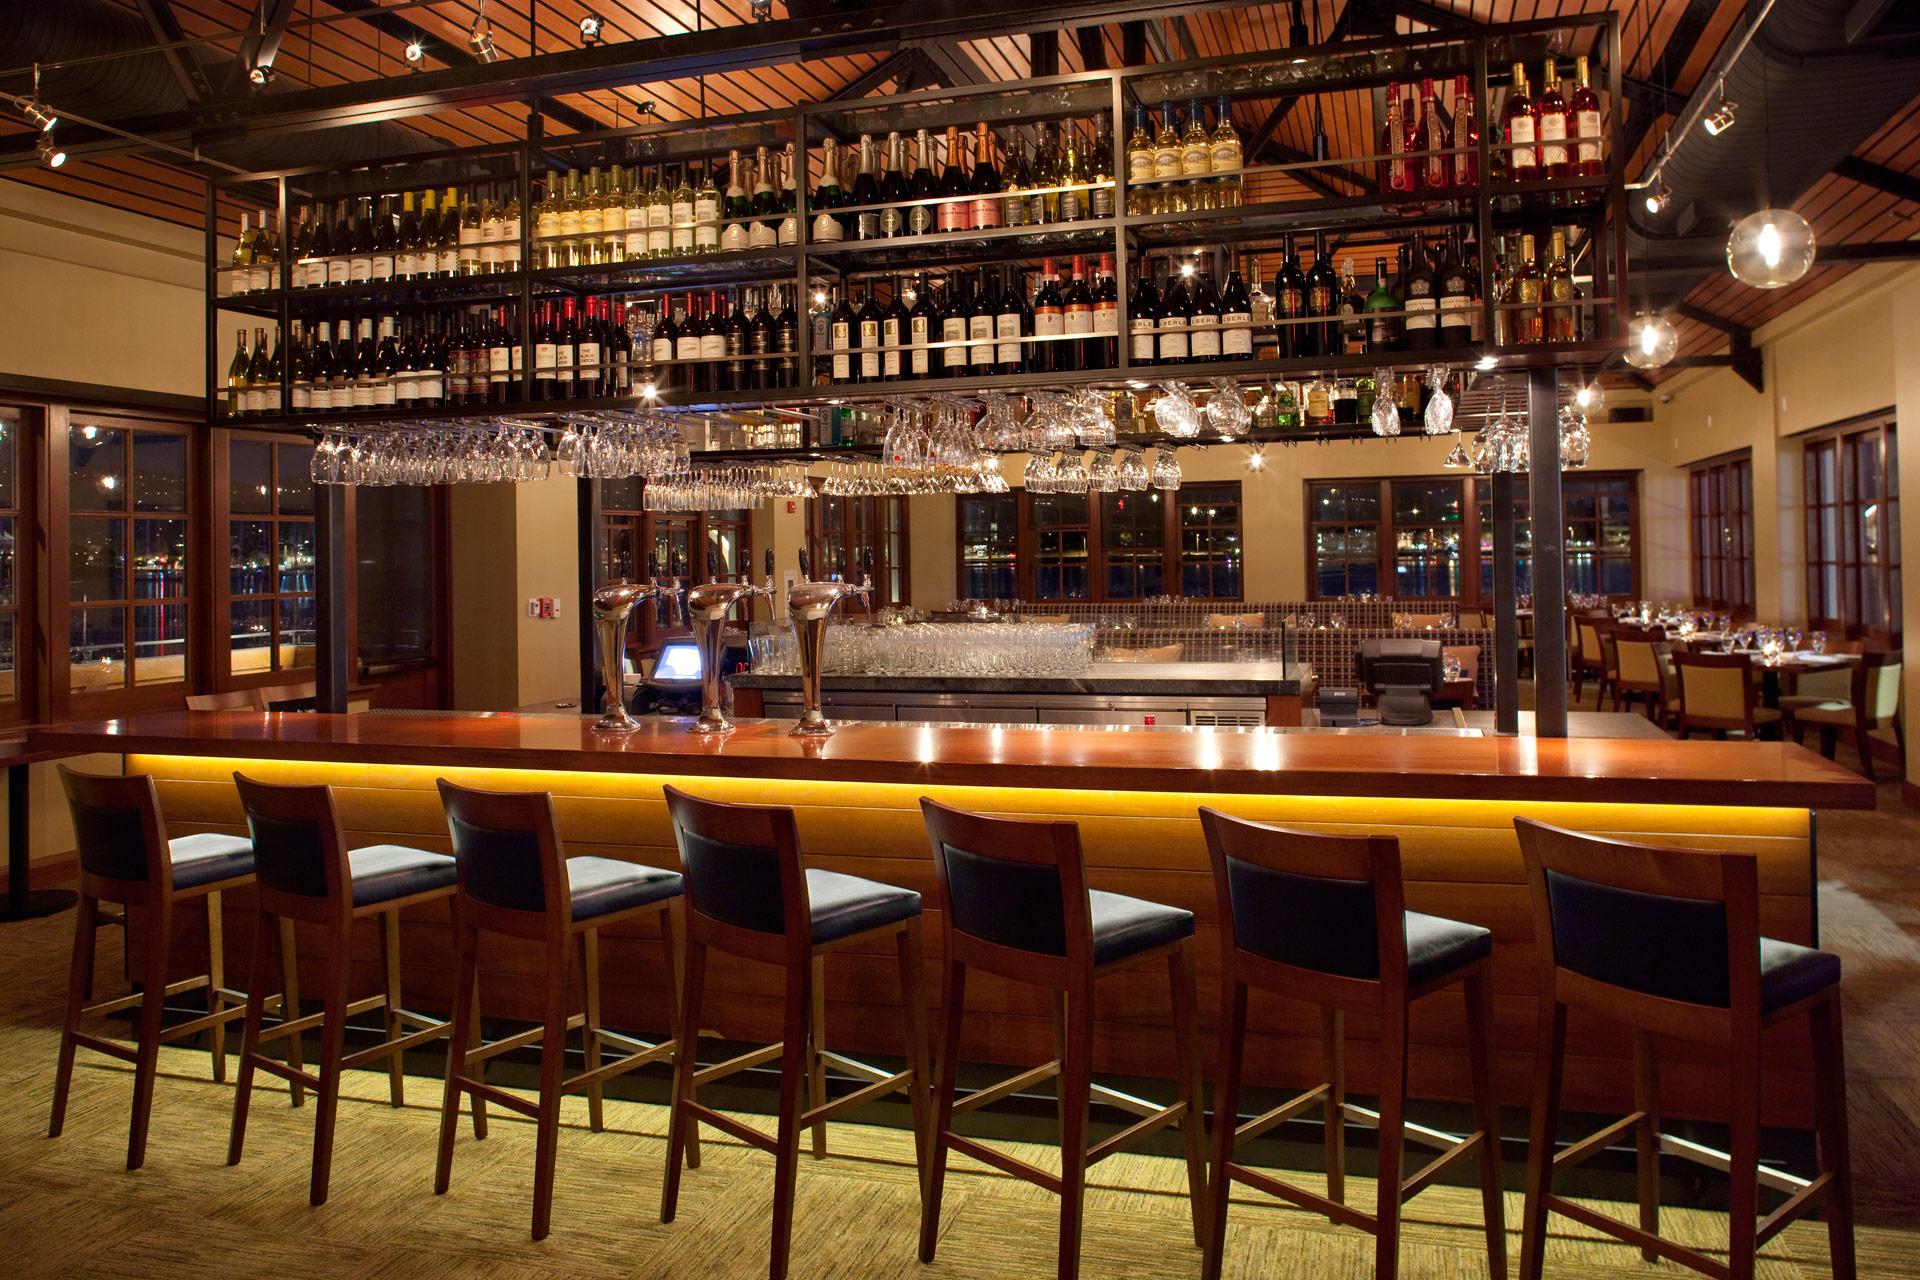 Lake Chalet restaurant interiors